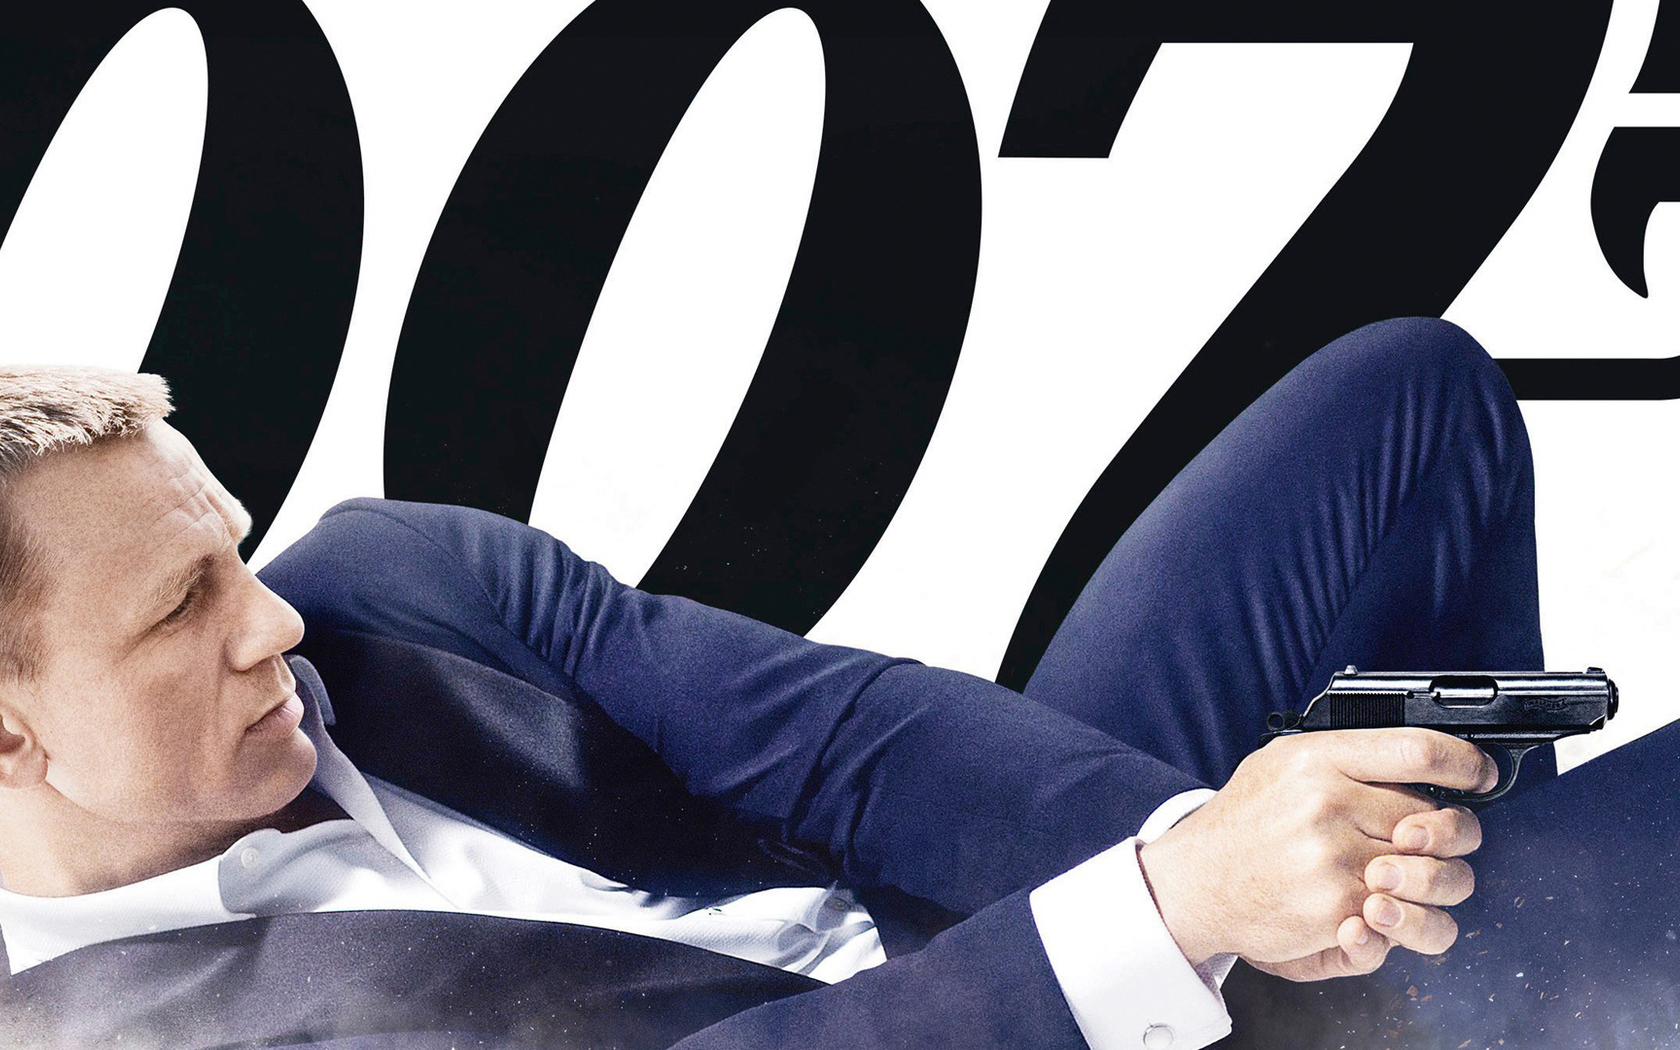 James Bond Wallpaper P 1680x1050 pixel Windows HD Wallpaper 36031 1680x1050